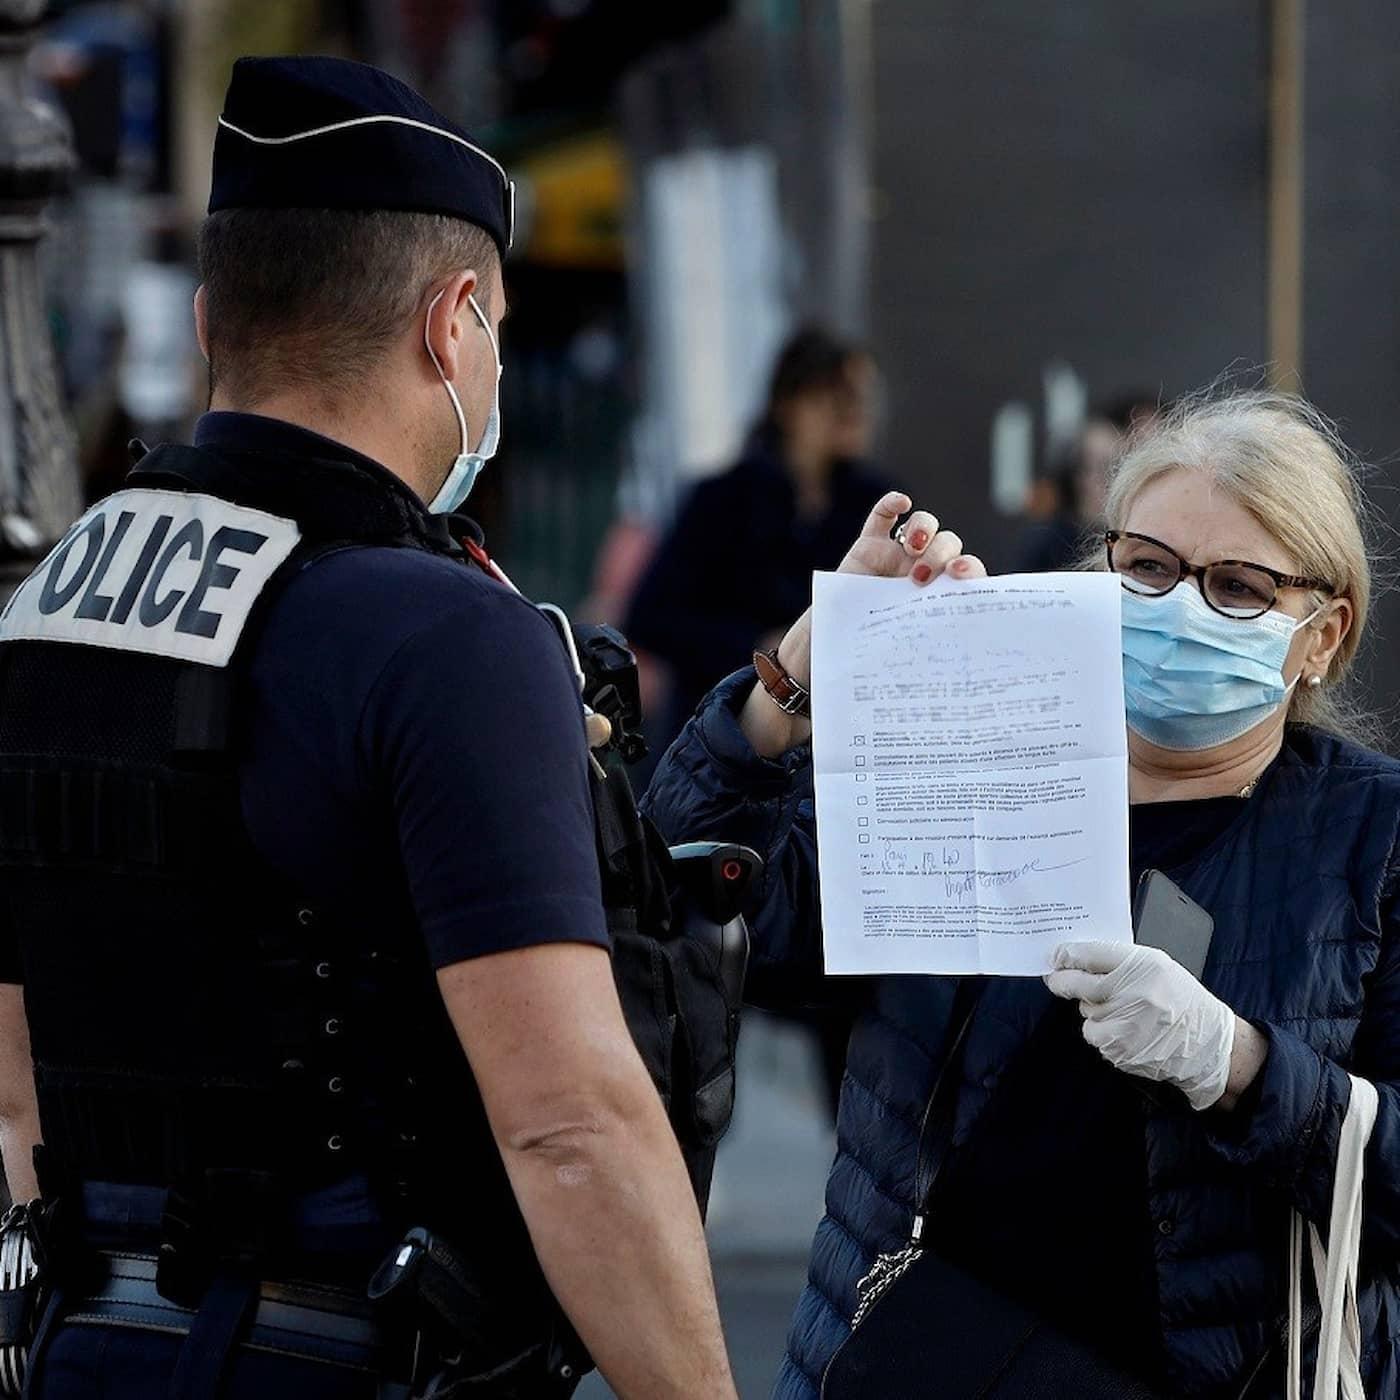 Frihetens pris i pandemin